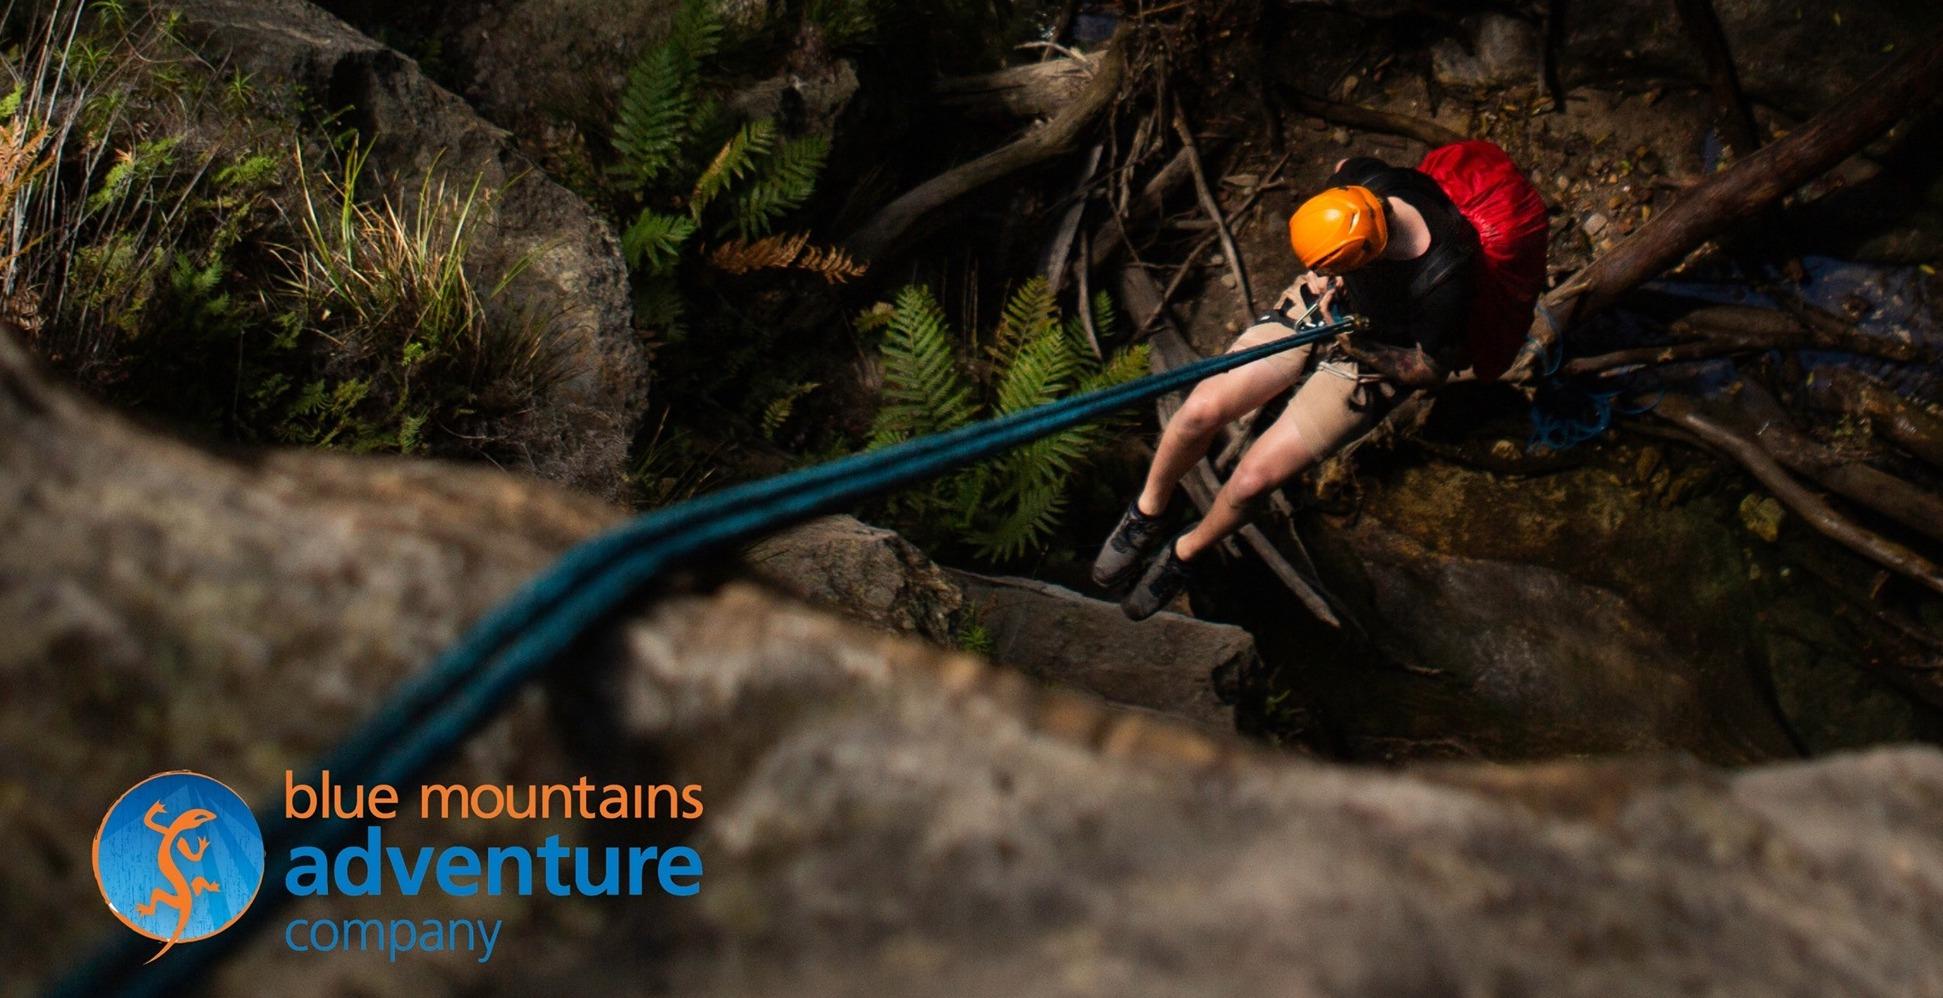 Blue Mountains Adventure Company